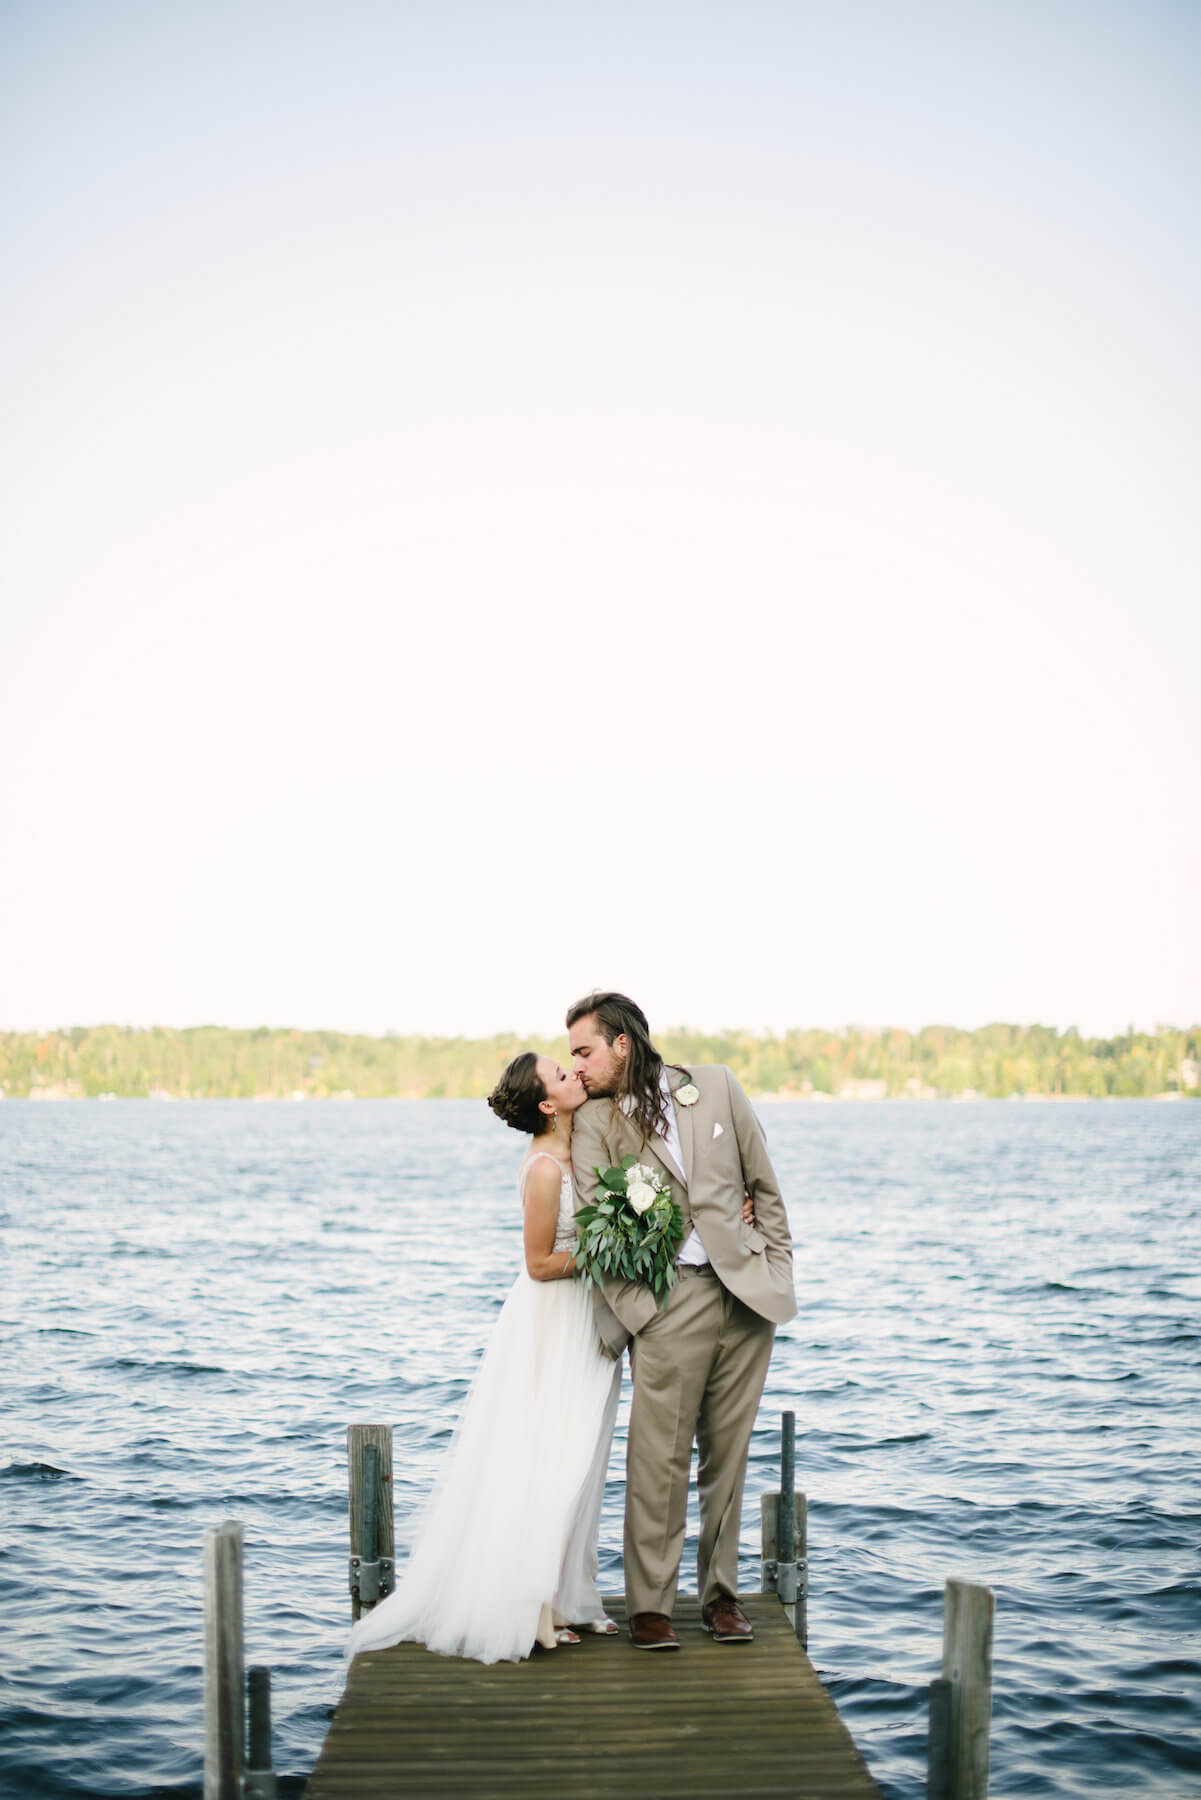 engle-olson-wedding-blair-taylor-37.jpg